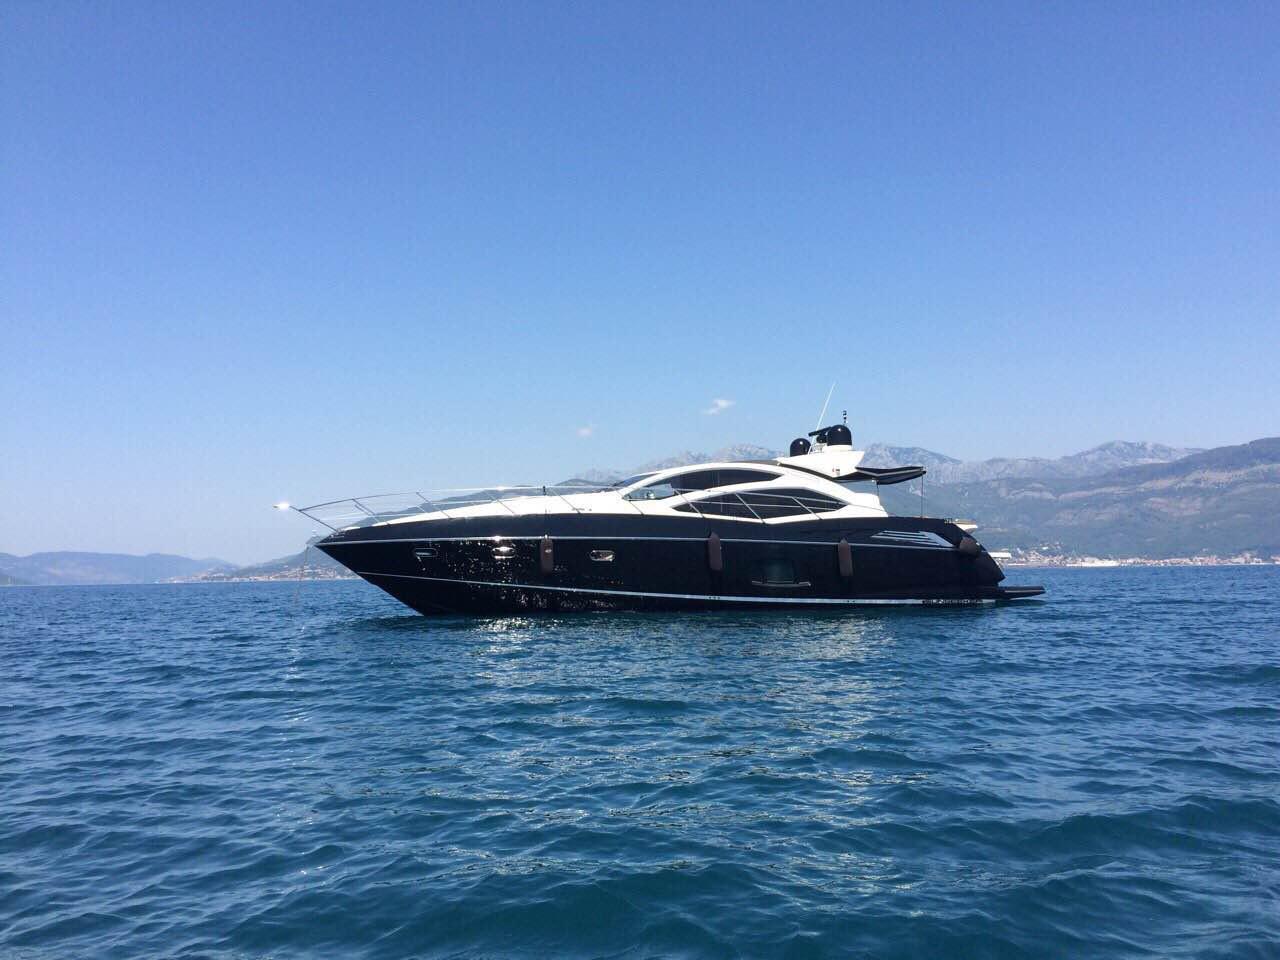 Sunseeker Predator 64 For Sale In Montenegro For 625 000